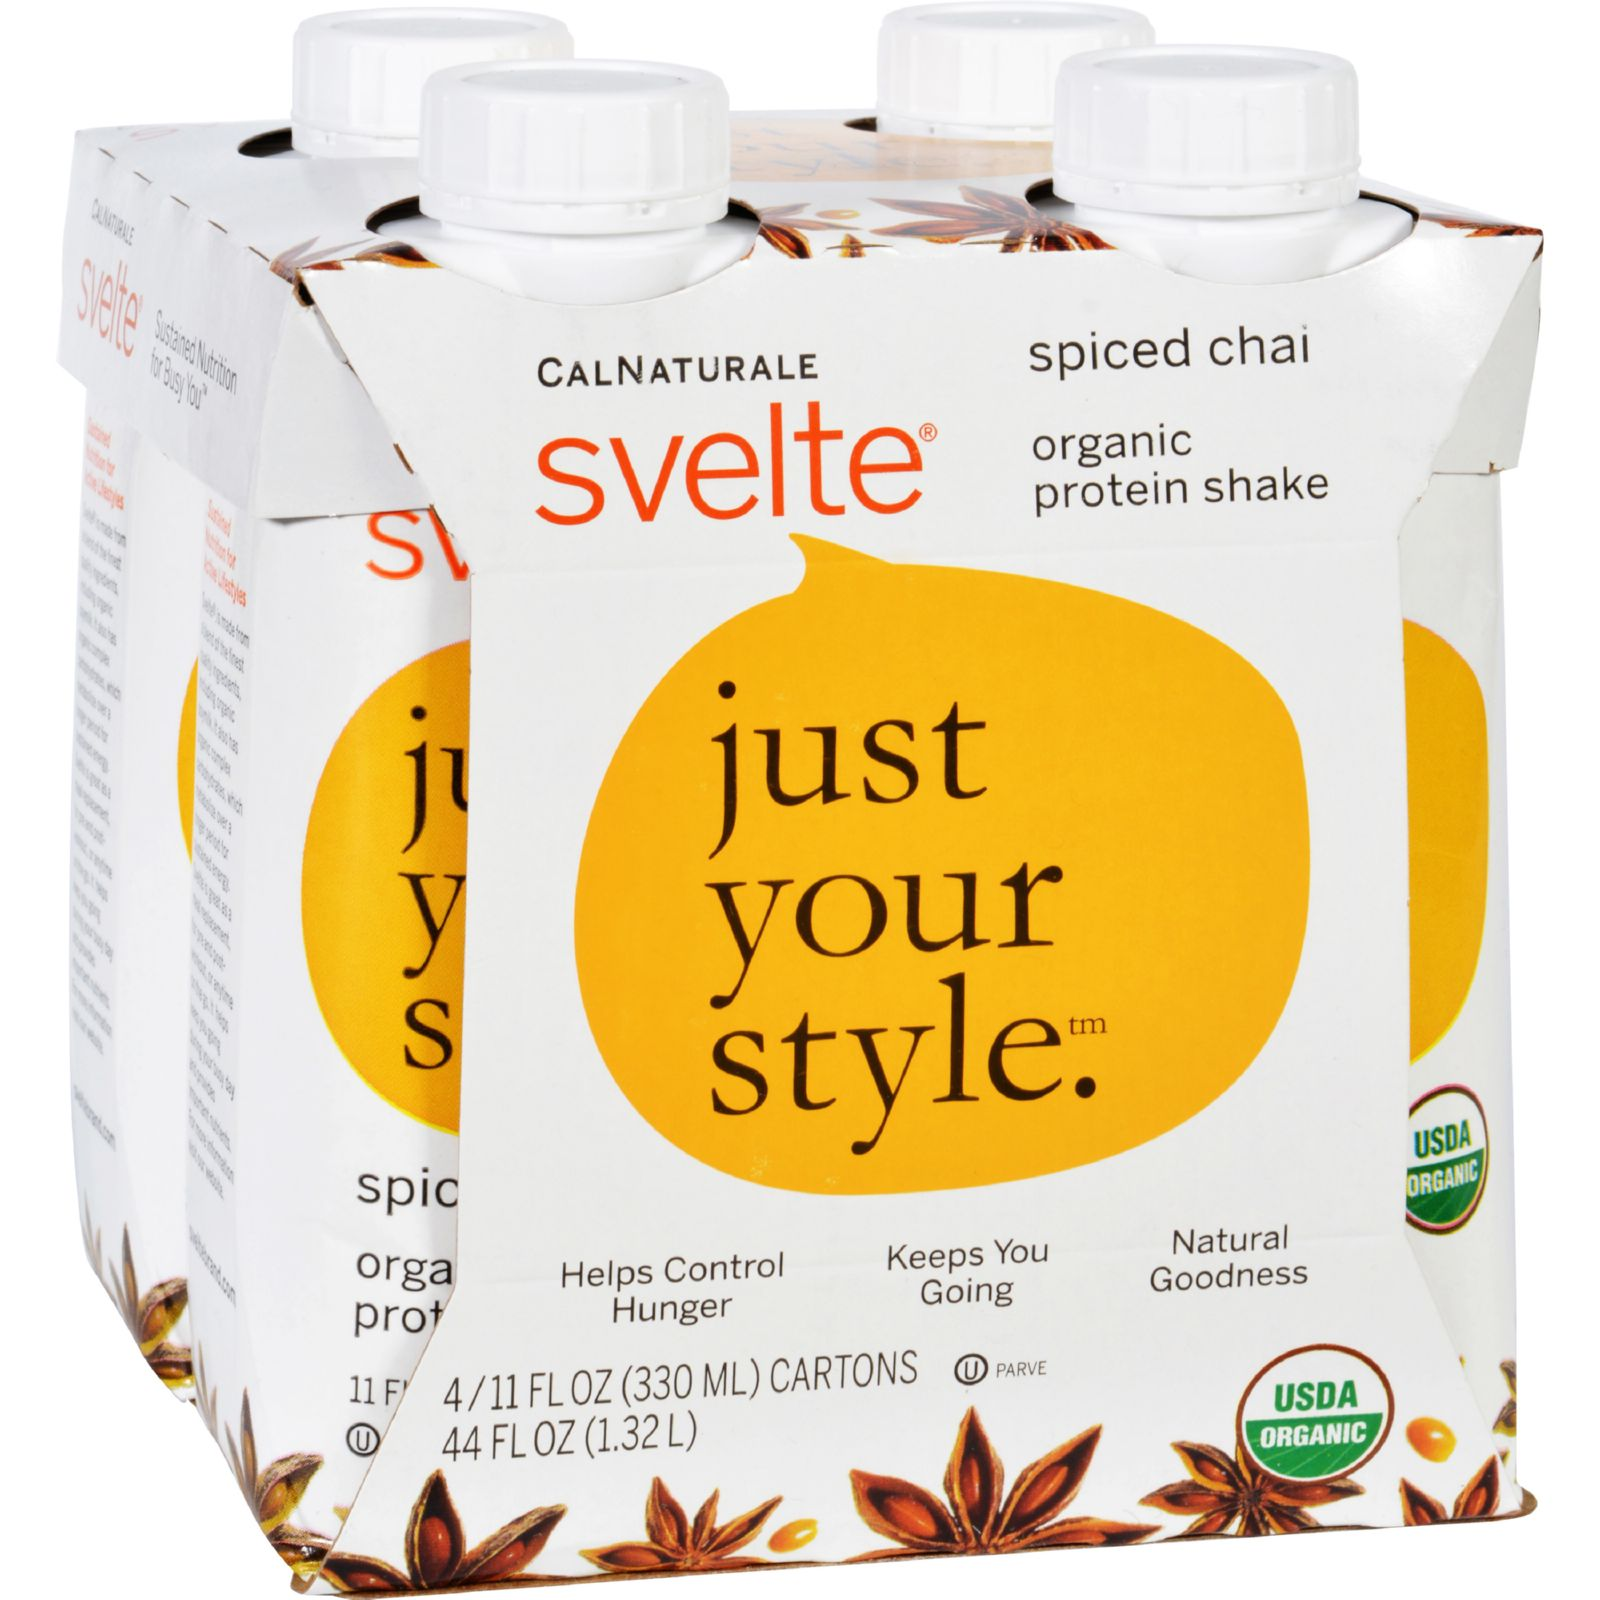 Svelte Organic Protein Shake, Spice Chai, 11 Fl Oz, 4 Ct